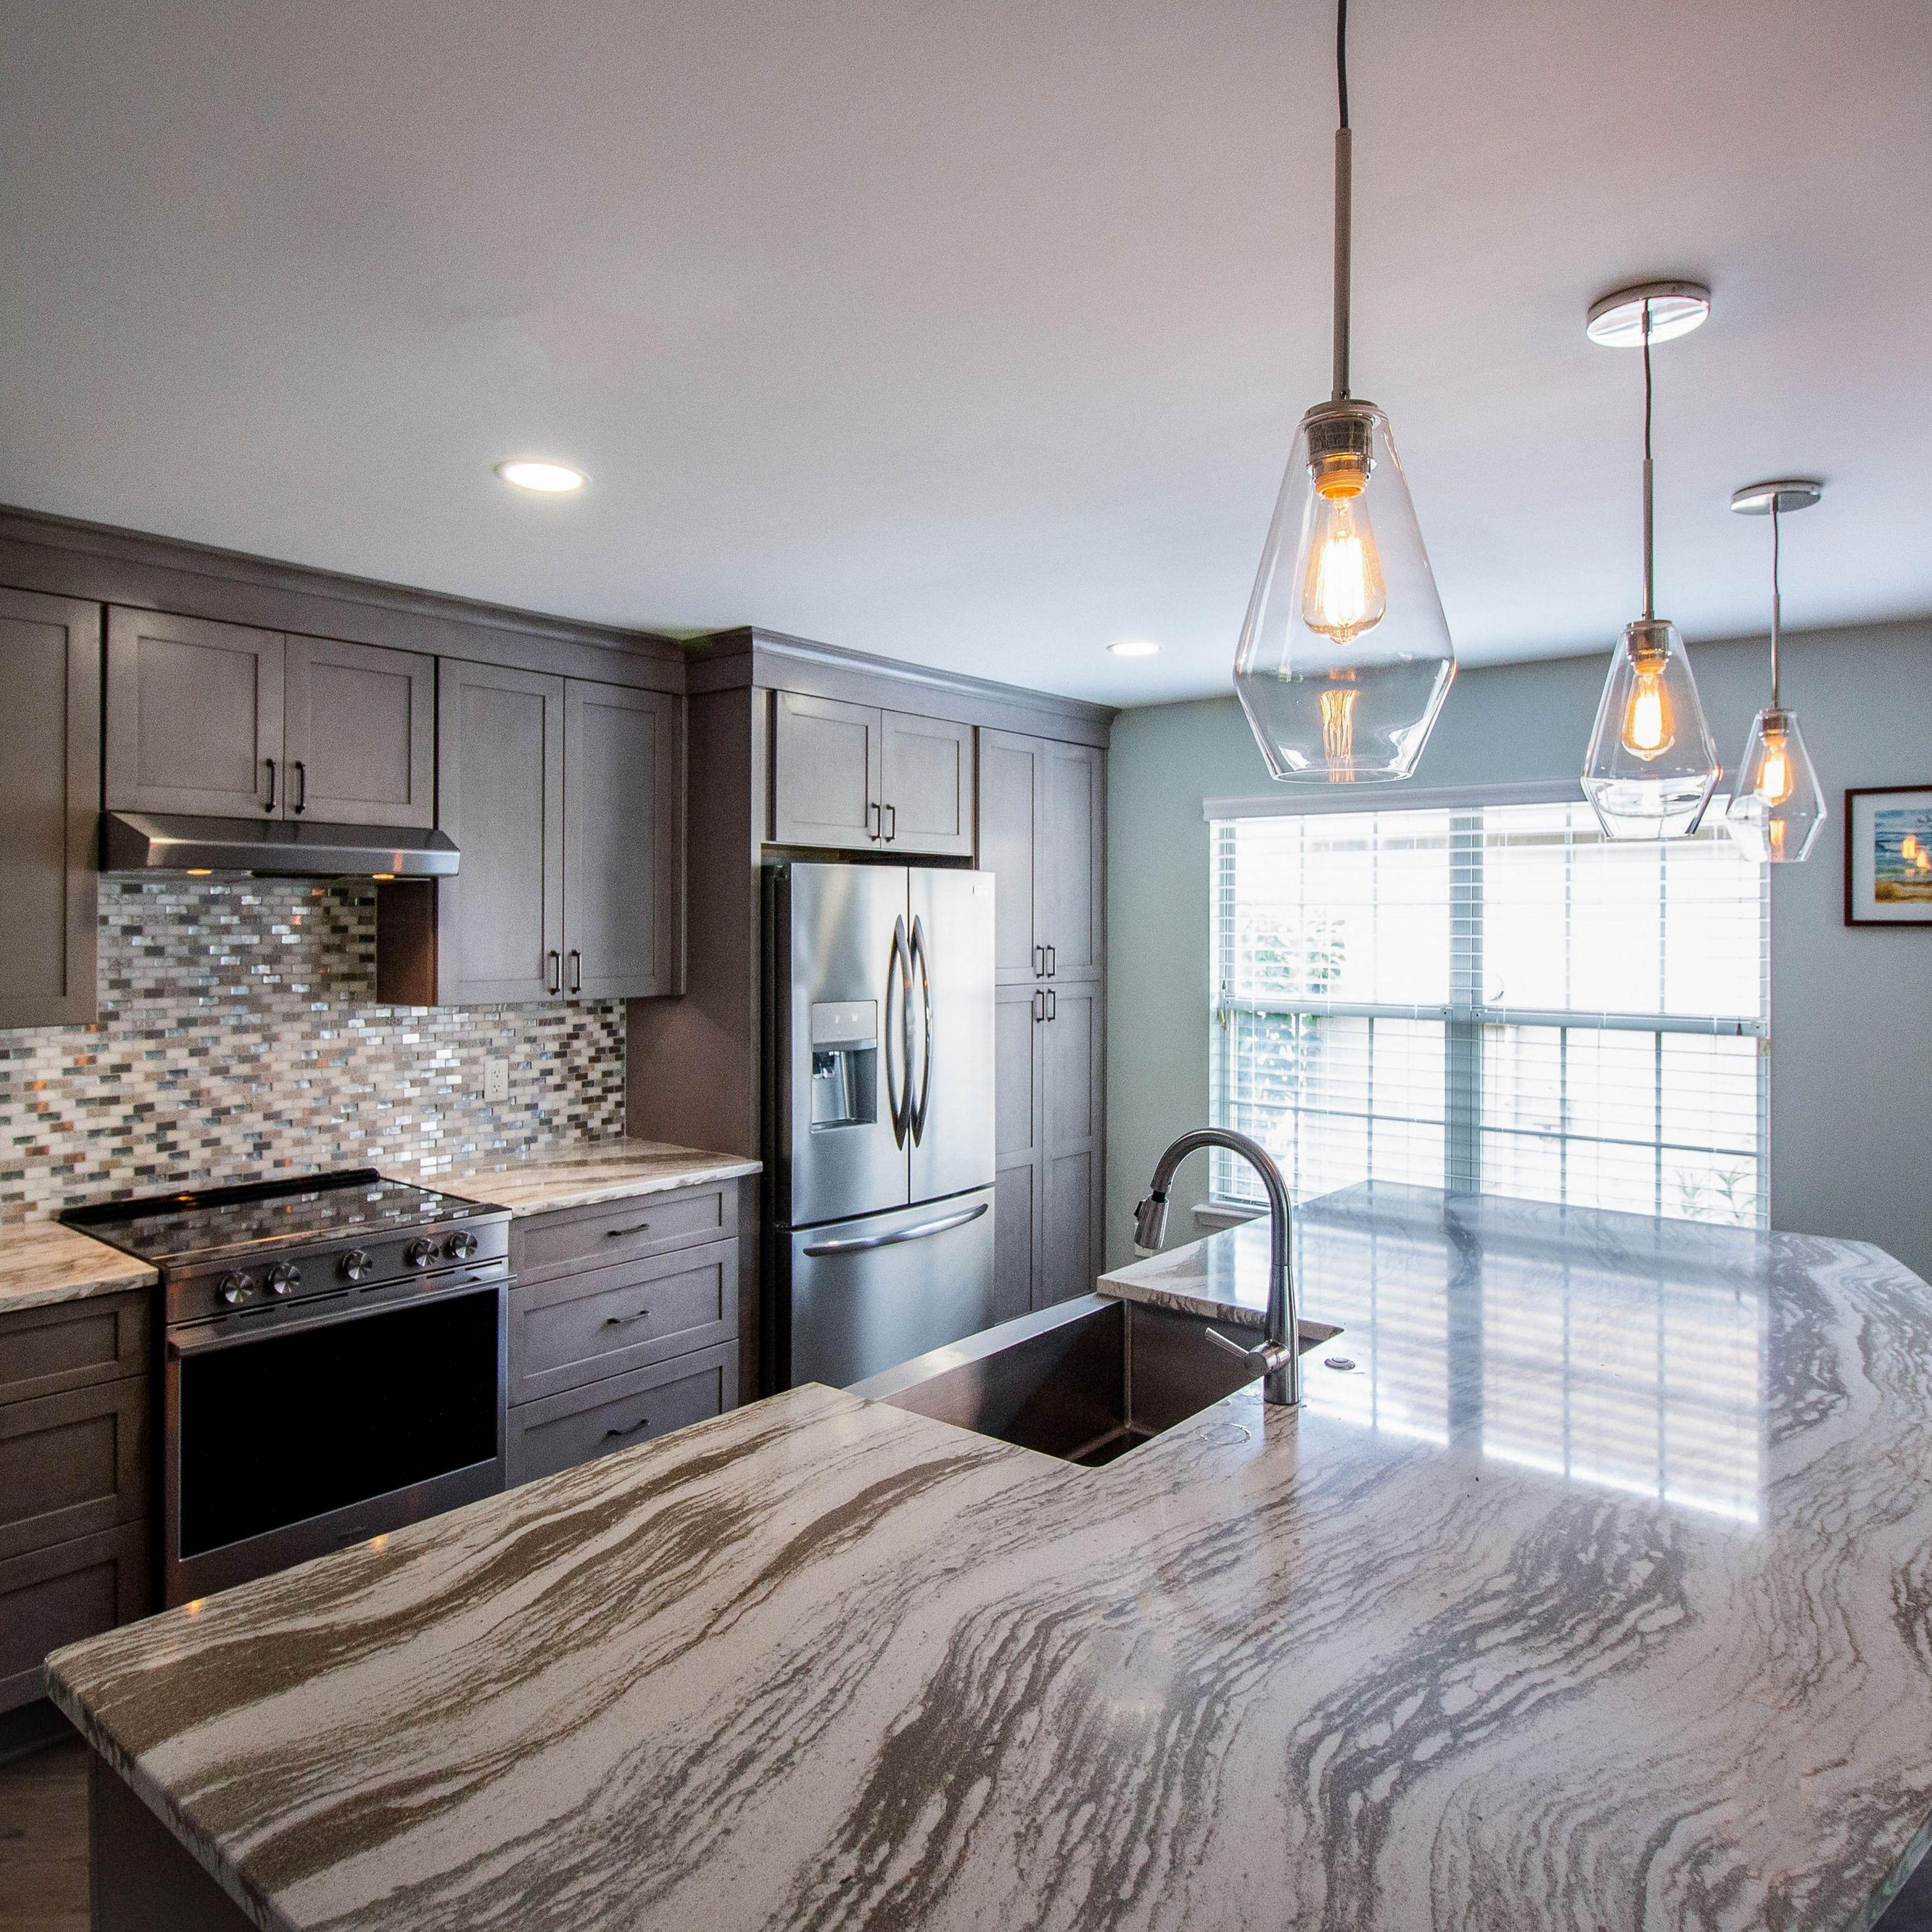 Kitchen and bath remodeling jacksonville fl - Household